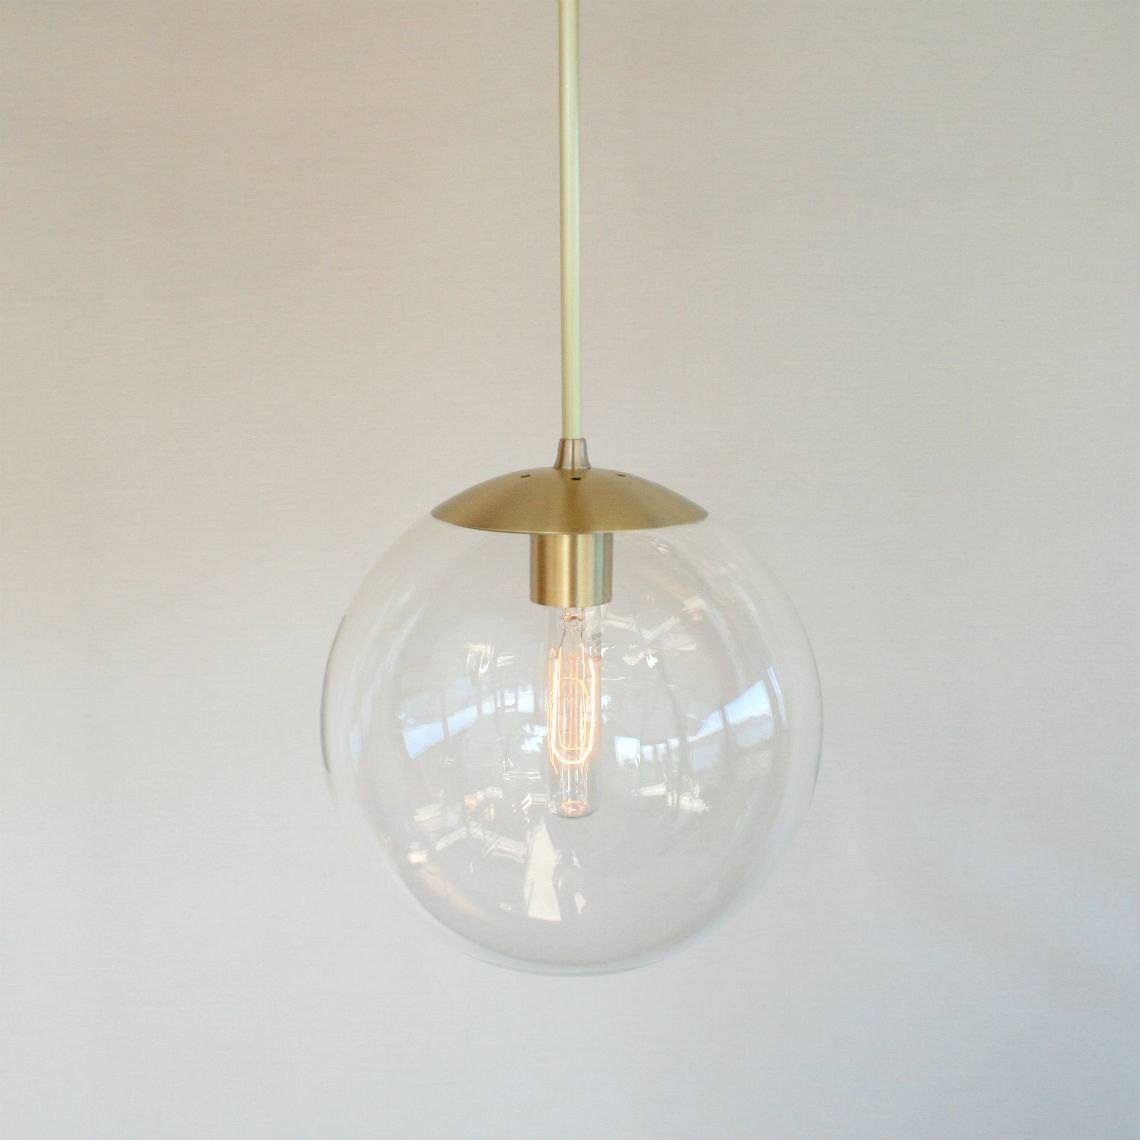 Pendant Lighting Ideas (View 12 of 15)